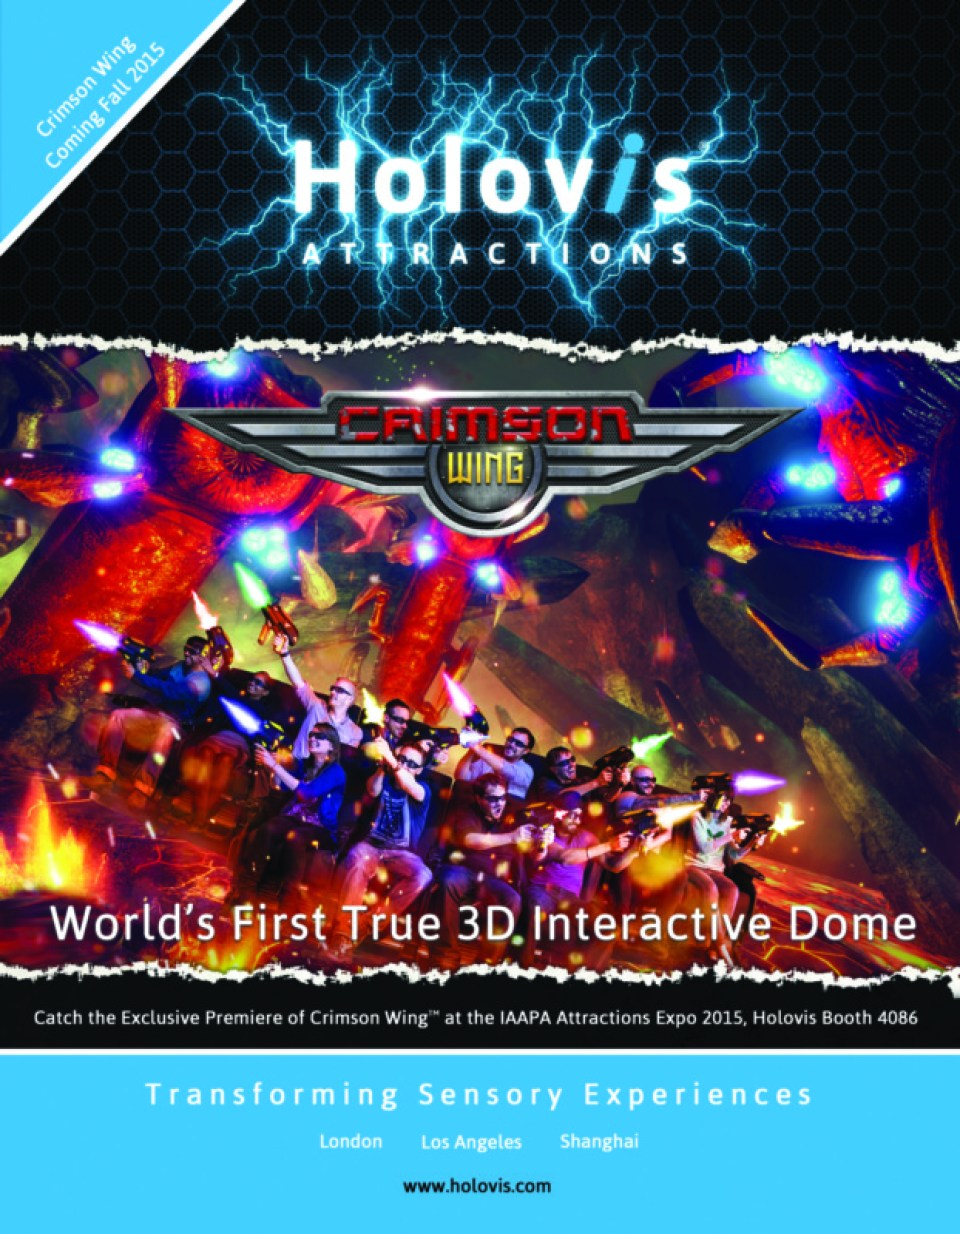 holovis new